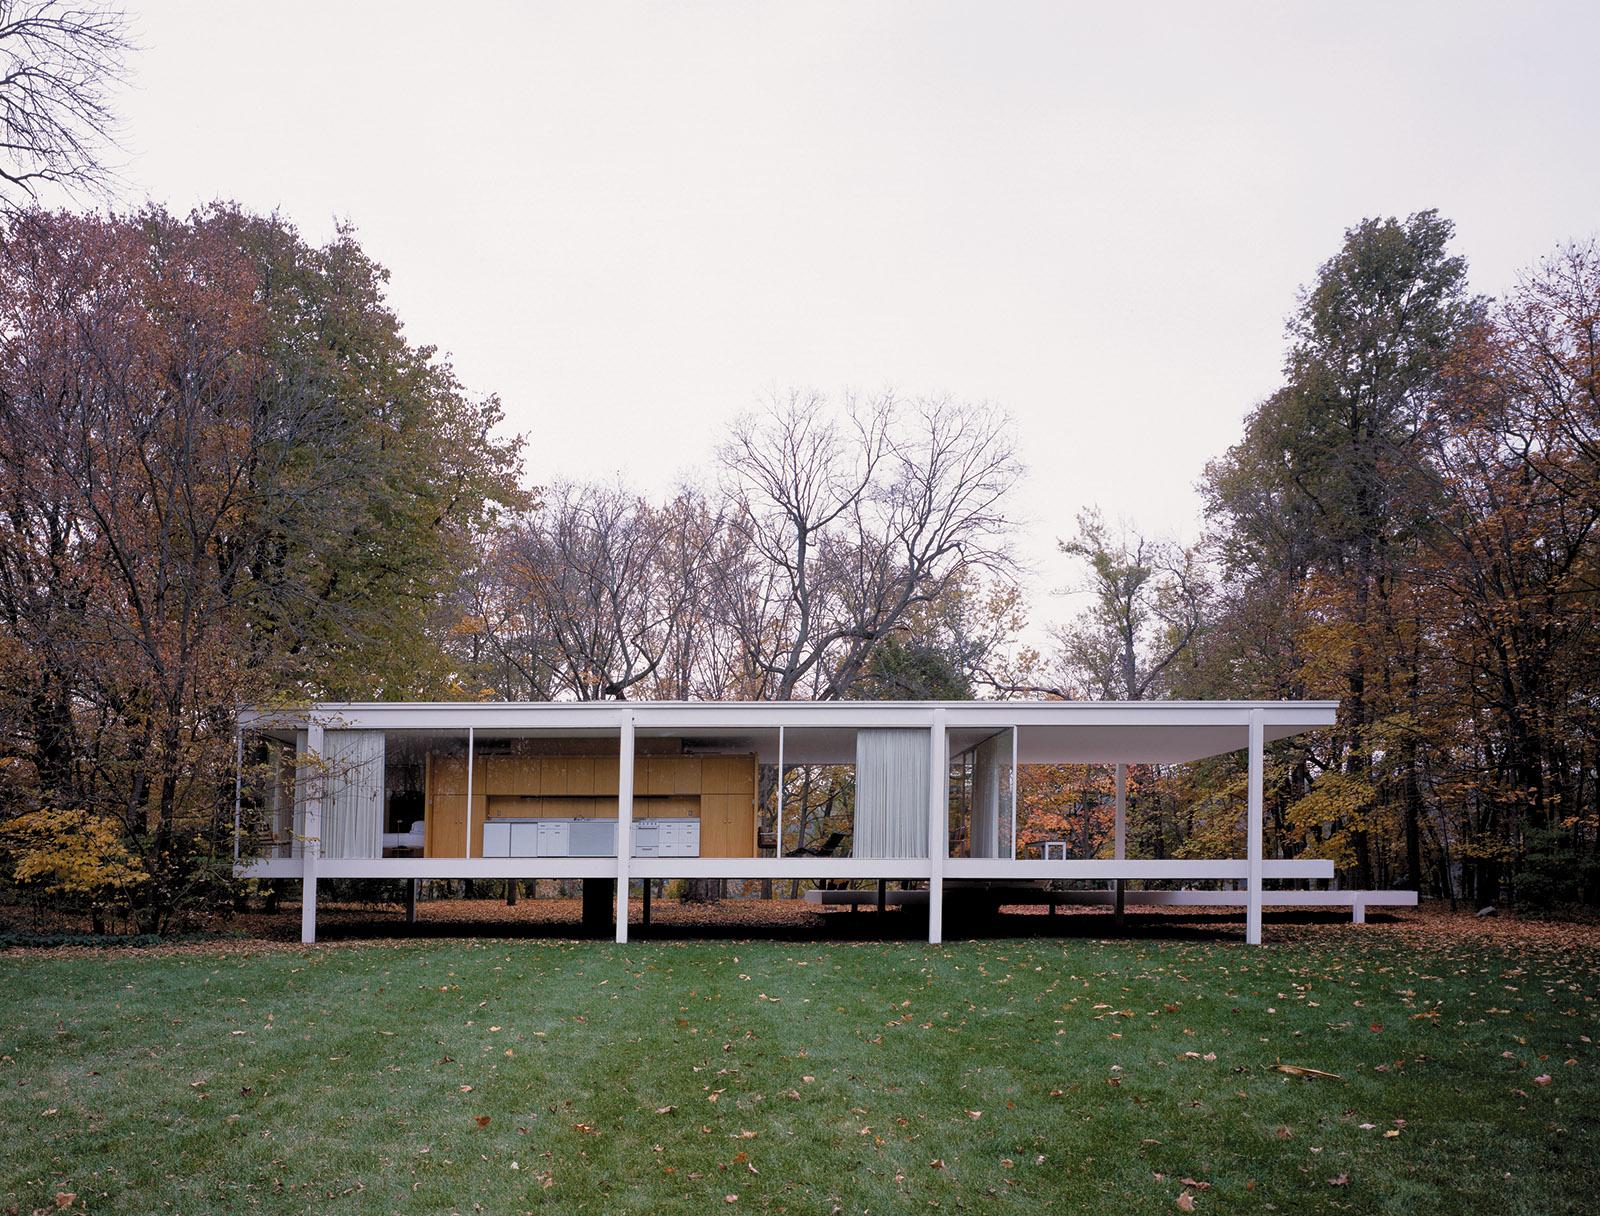 The Farnsworth house